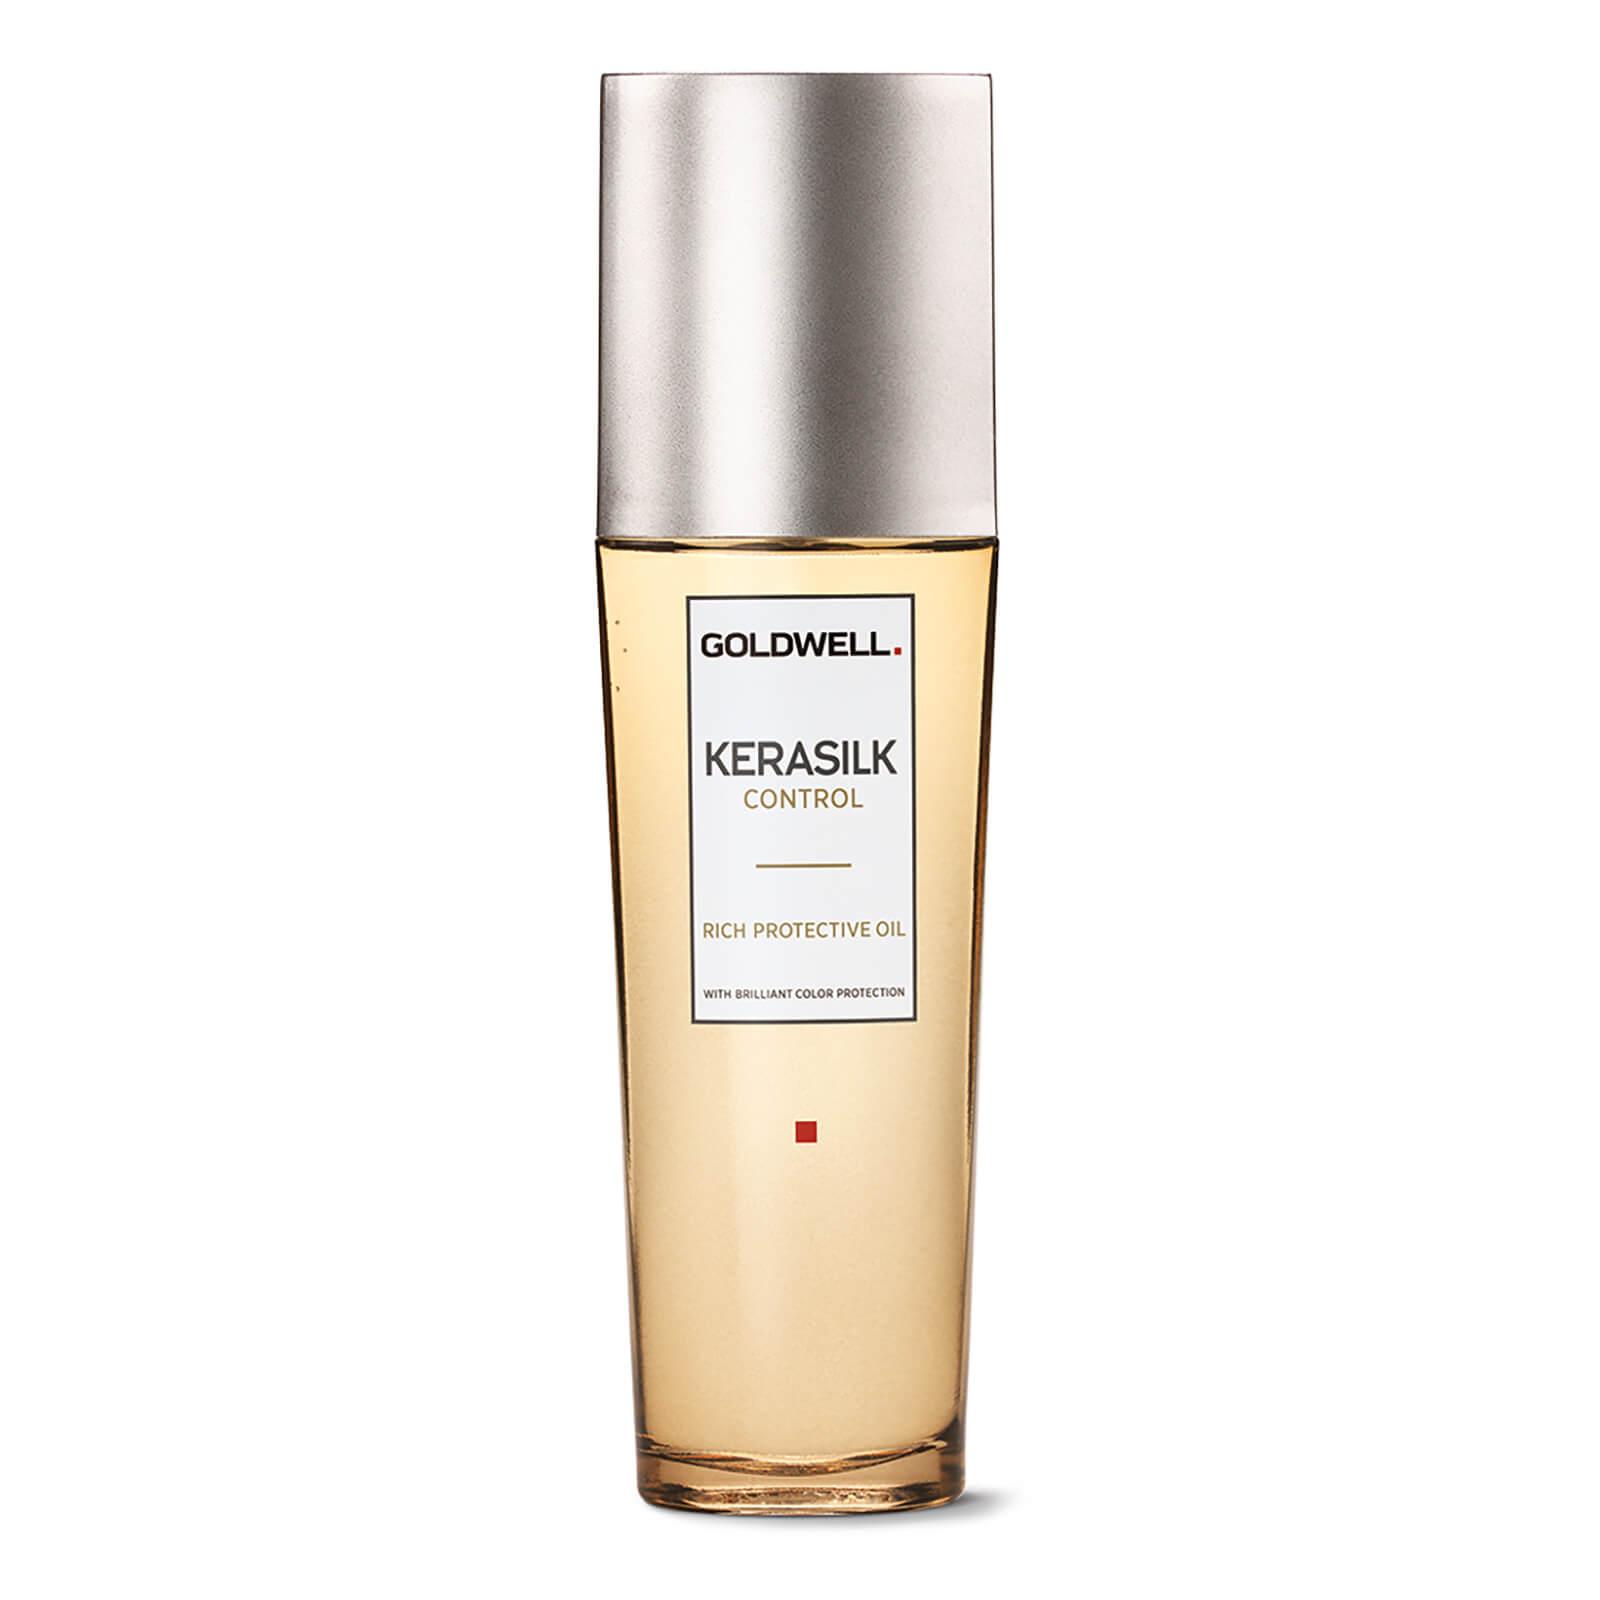 Купить Goldwell Kerasilk Control Rich Protective Oil 75ml